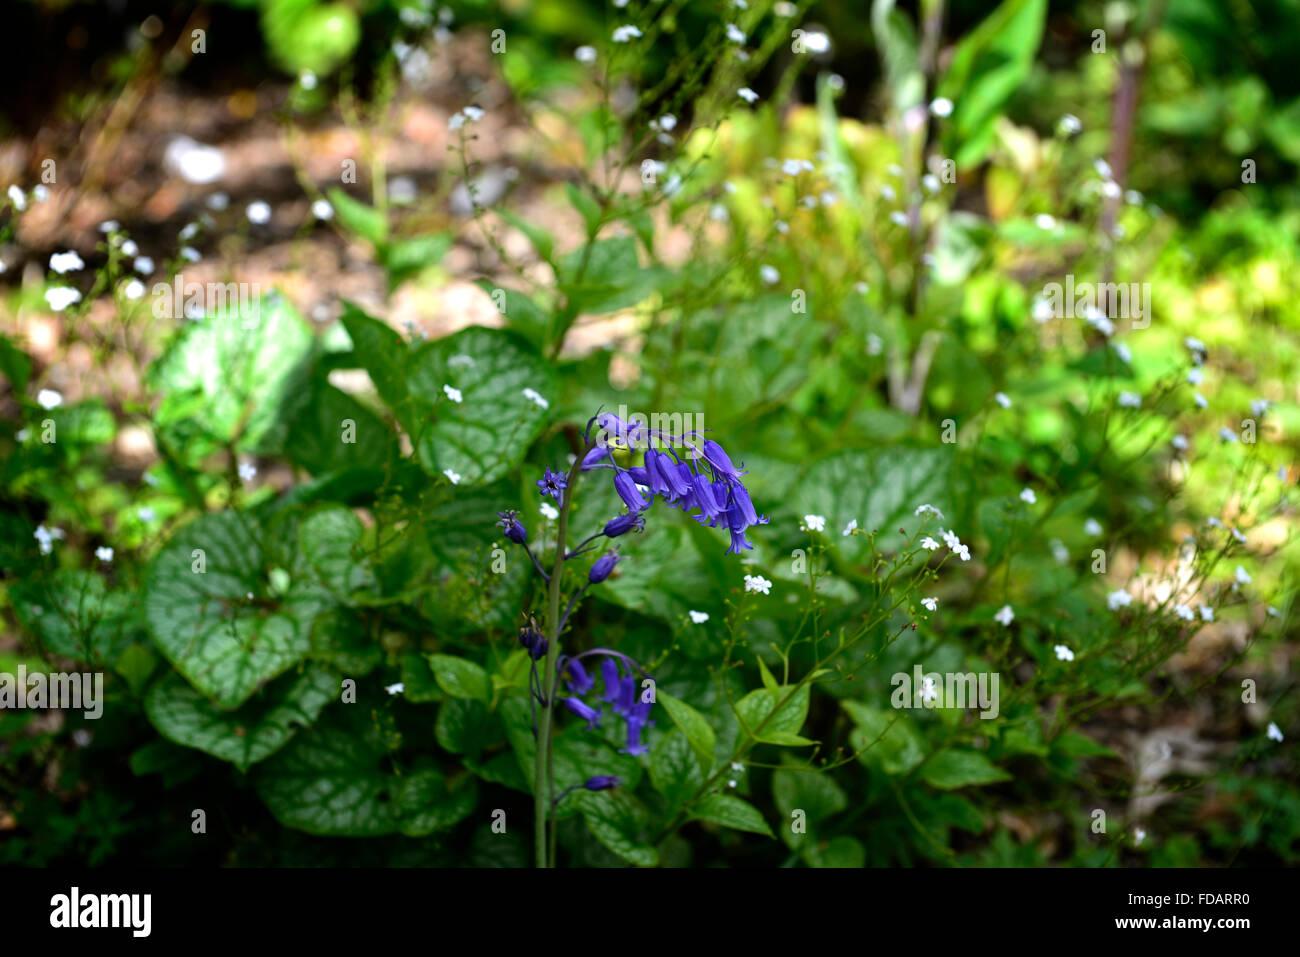 Bluebell Brunnera macrophylla Mr Morse Heartleaf brunnera Siberian bugloss shade shady shaded woodland garden RM - Stock Image